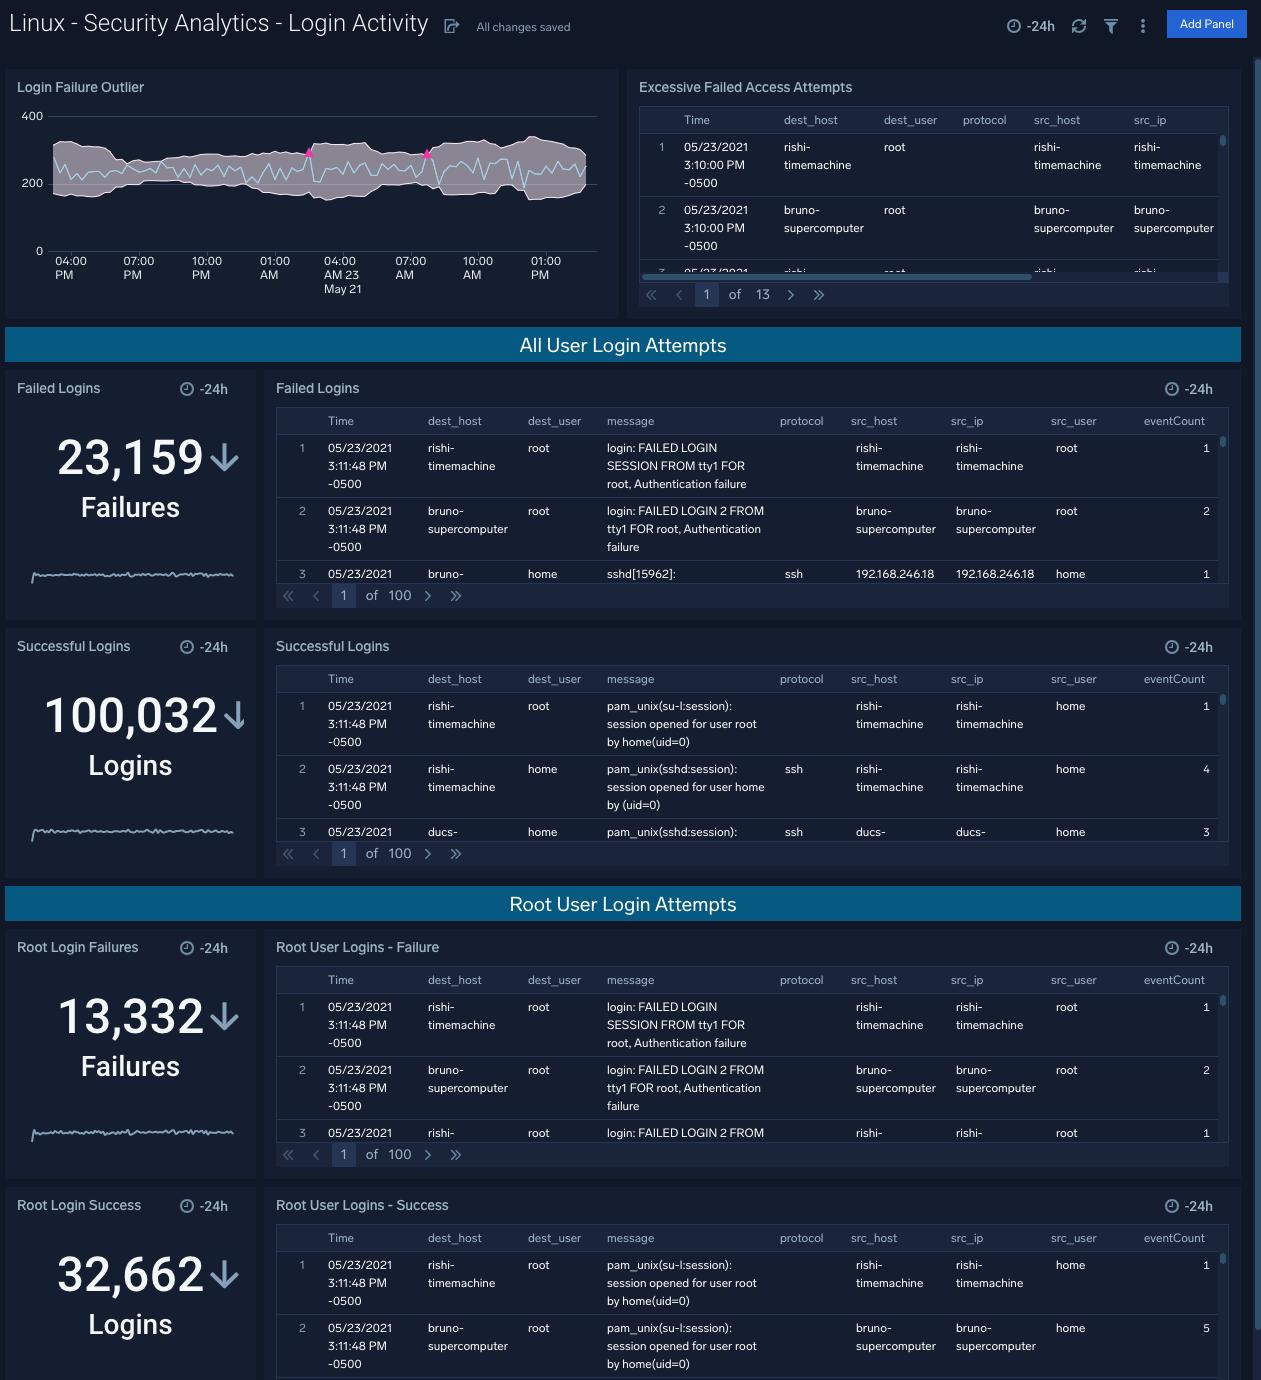 Linux - Security Analytics - Login Activity